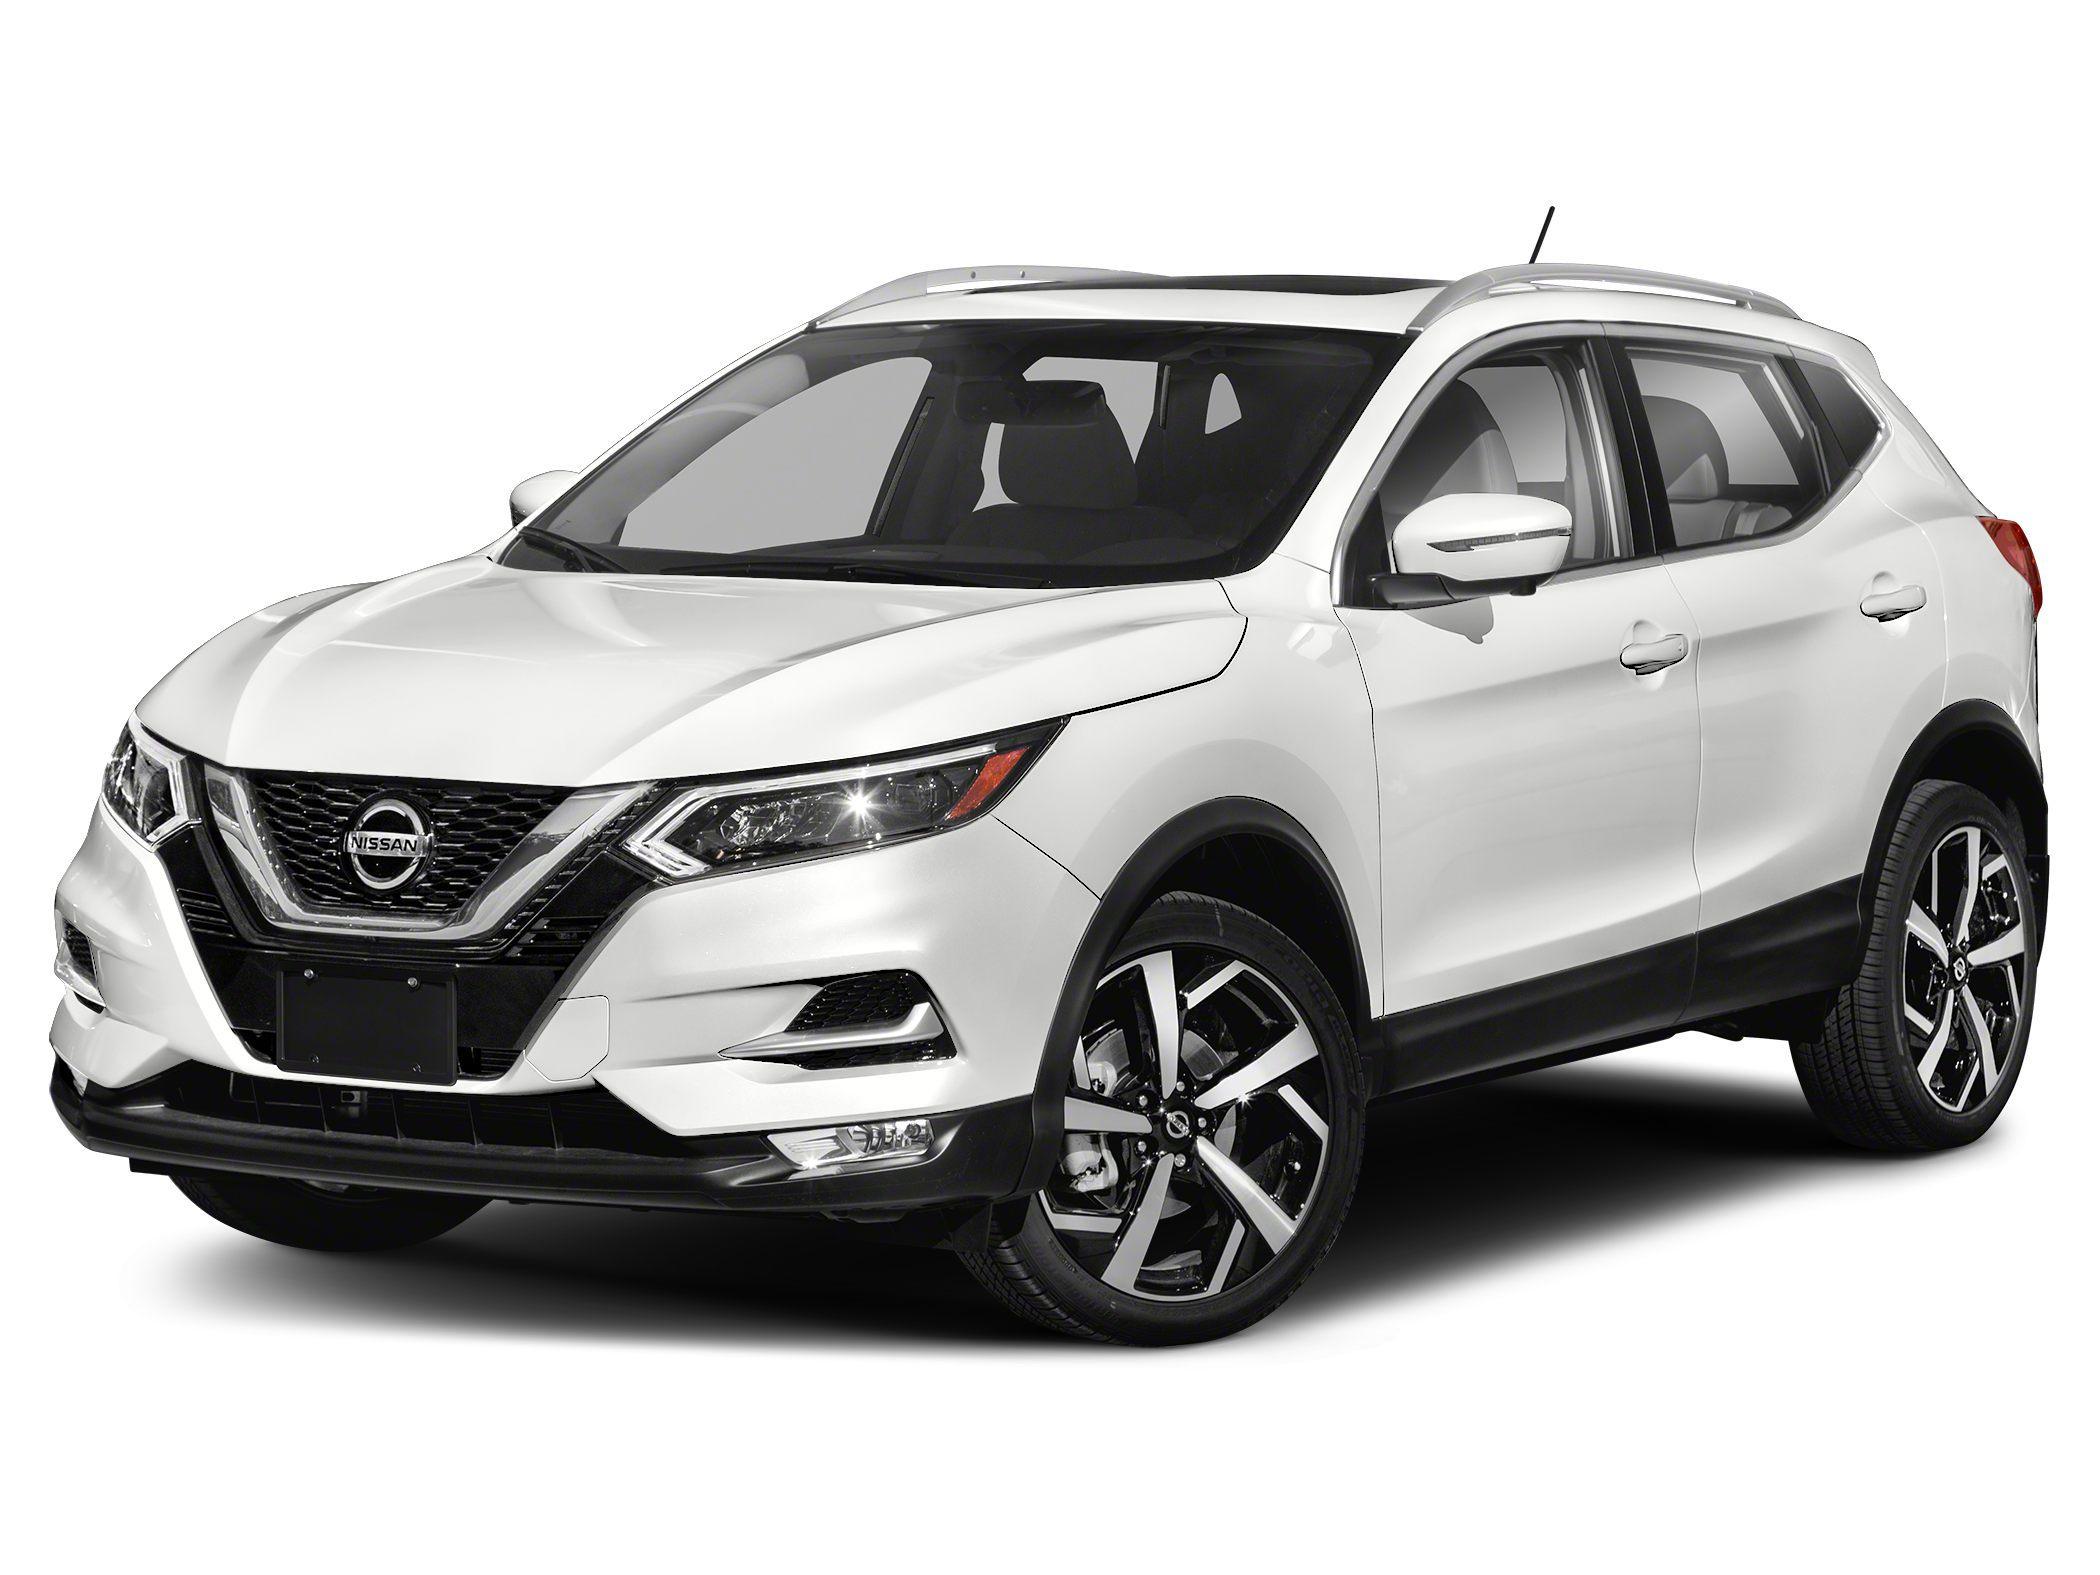 2021 Nissan Rogue Sport SUV